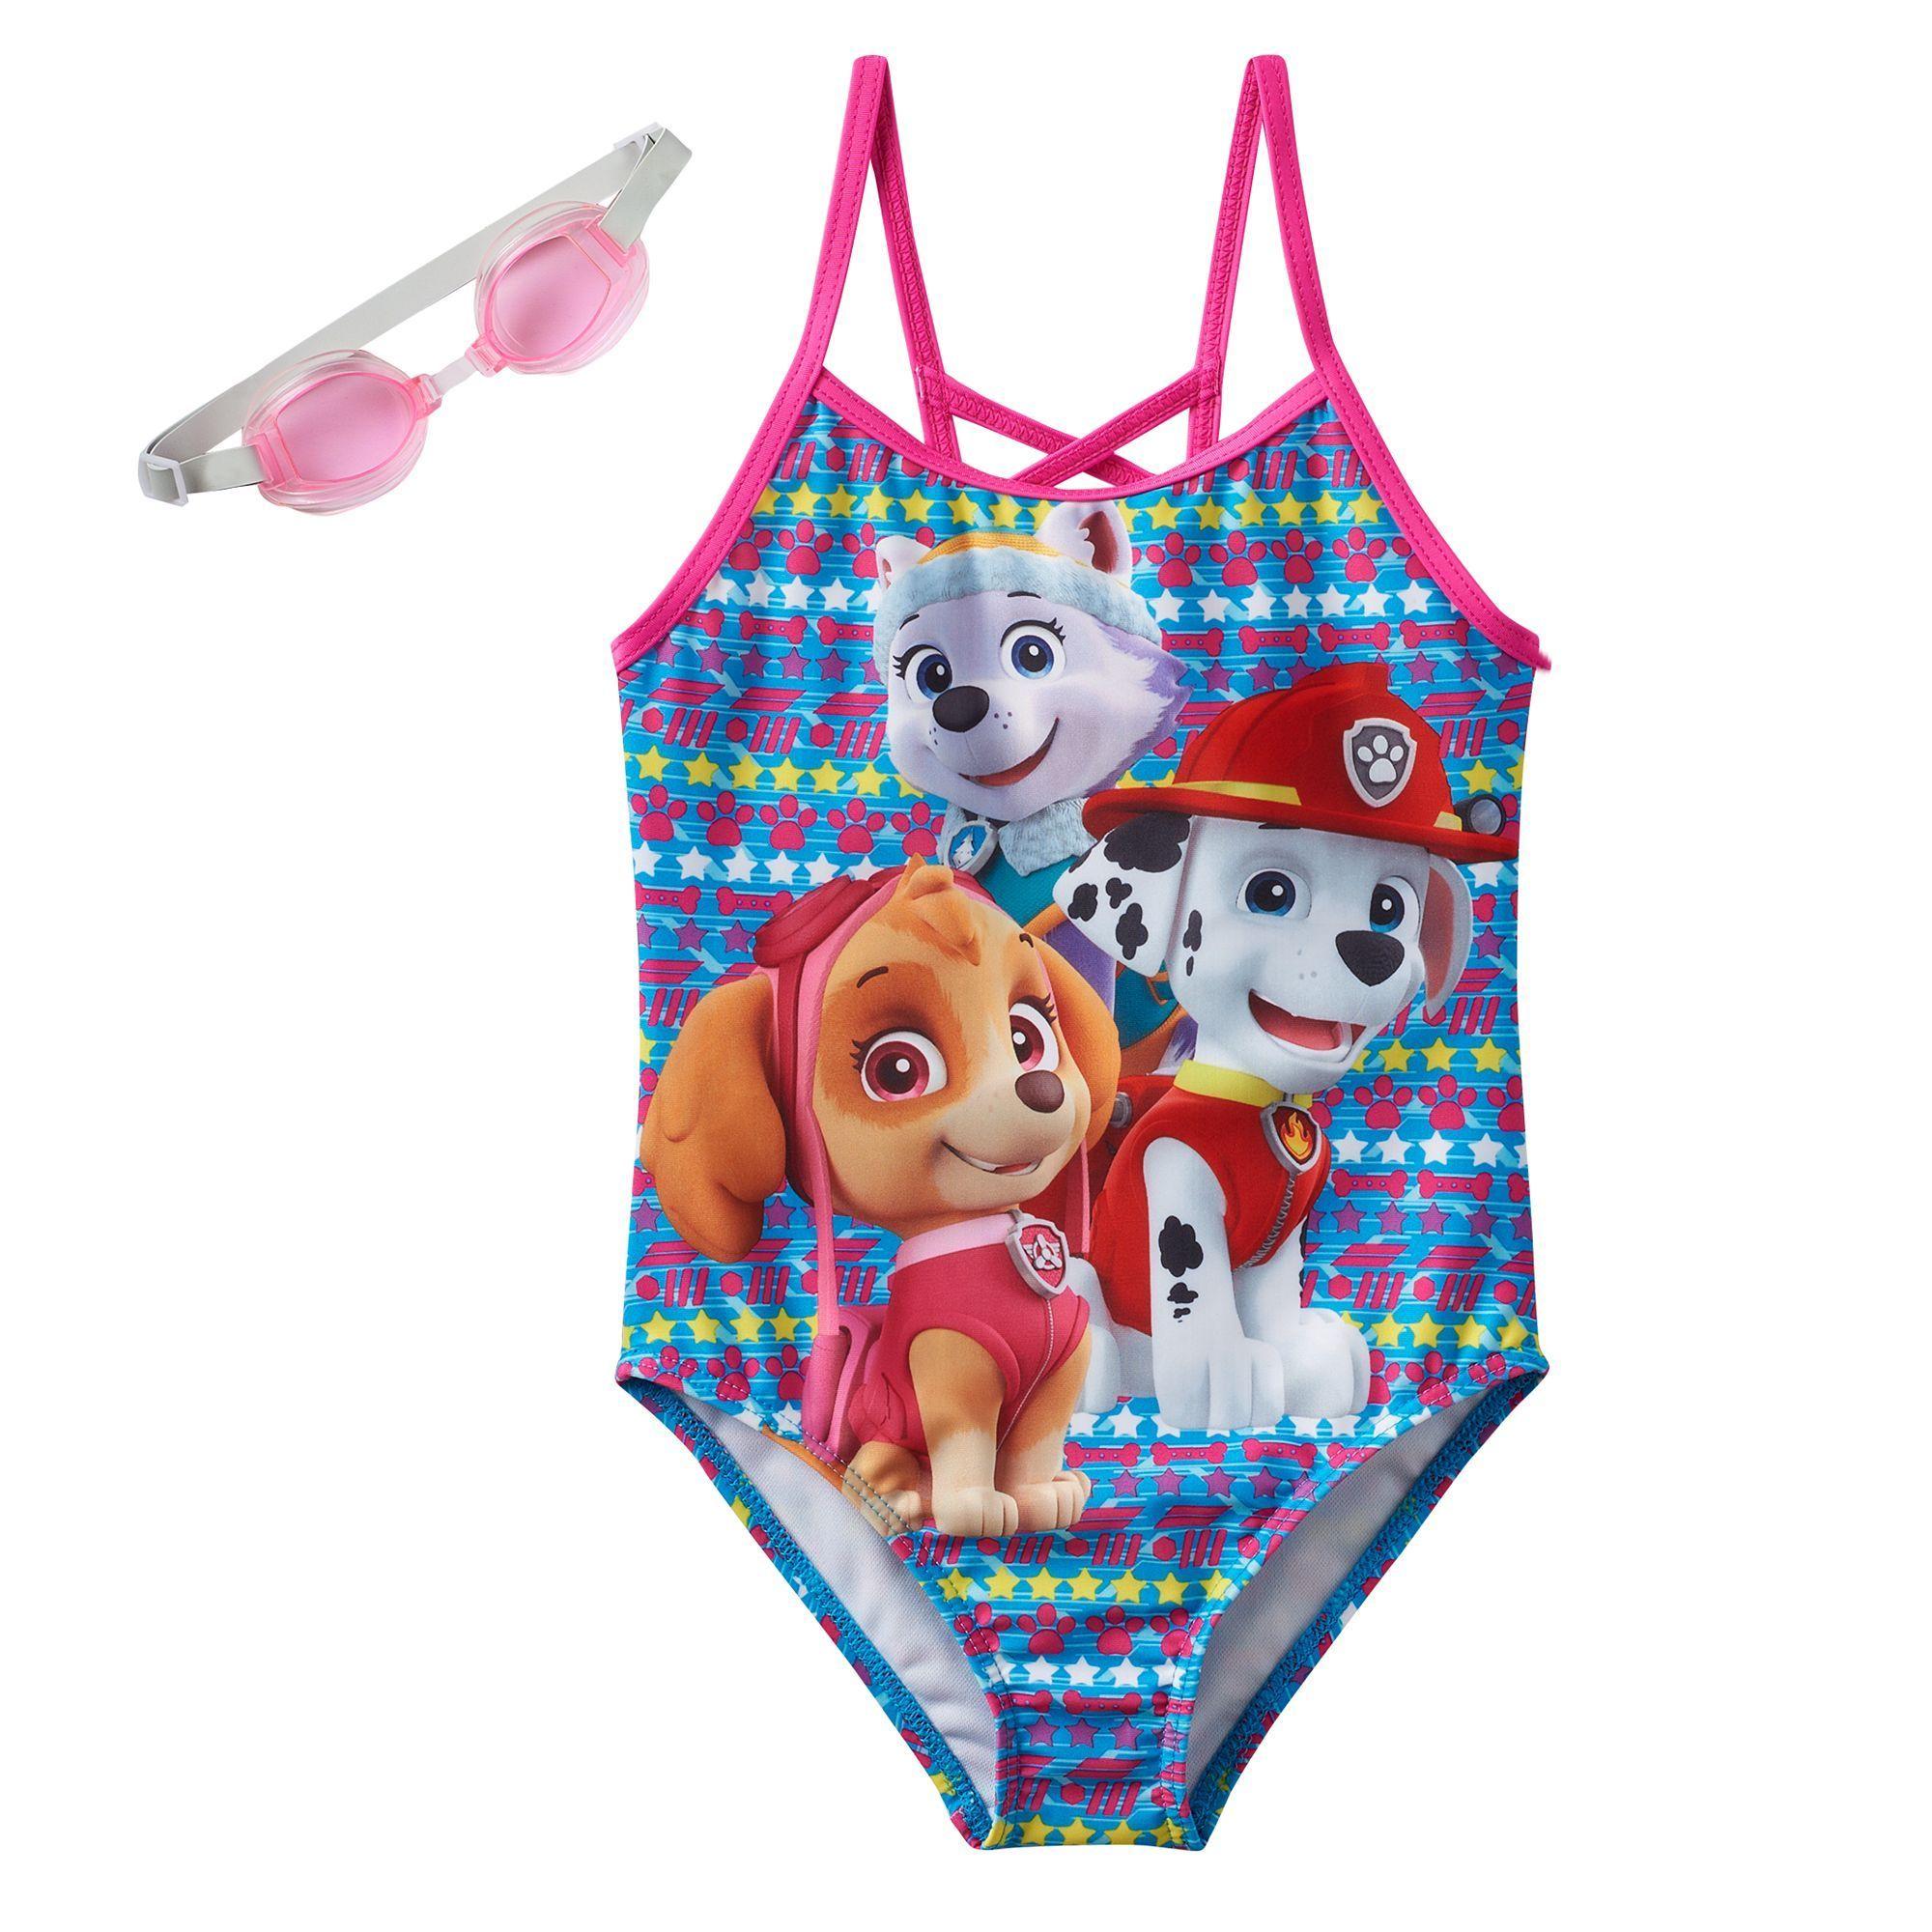 e9744c4f7e Girls 4-6x Paw Patrol Everest, Skye & Marshall One-Piece Swimsuit, Size:  5-6, Multicolor